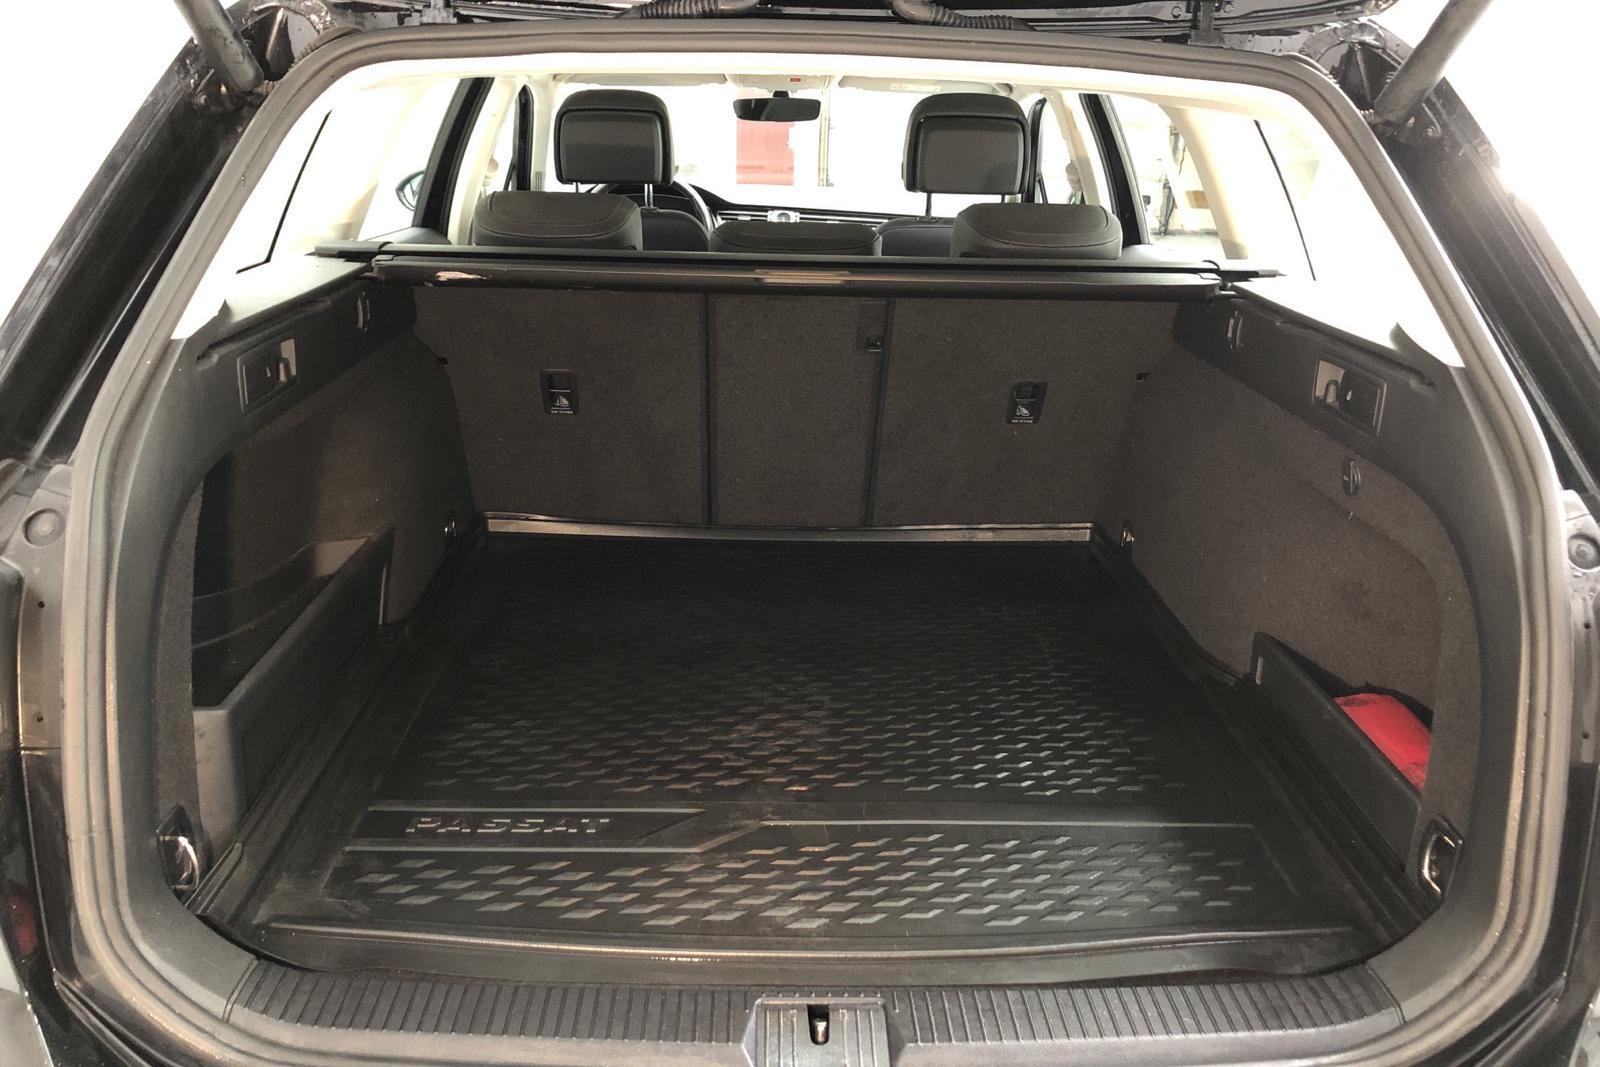 VW Passat 1.4 Plug-in-Hybrid Sportscombi (218hk) - 40 540 km - Automatic - black - 2018